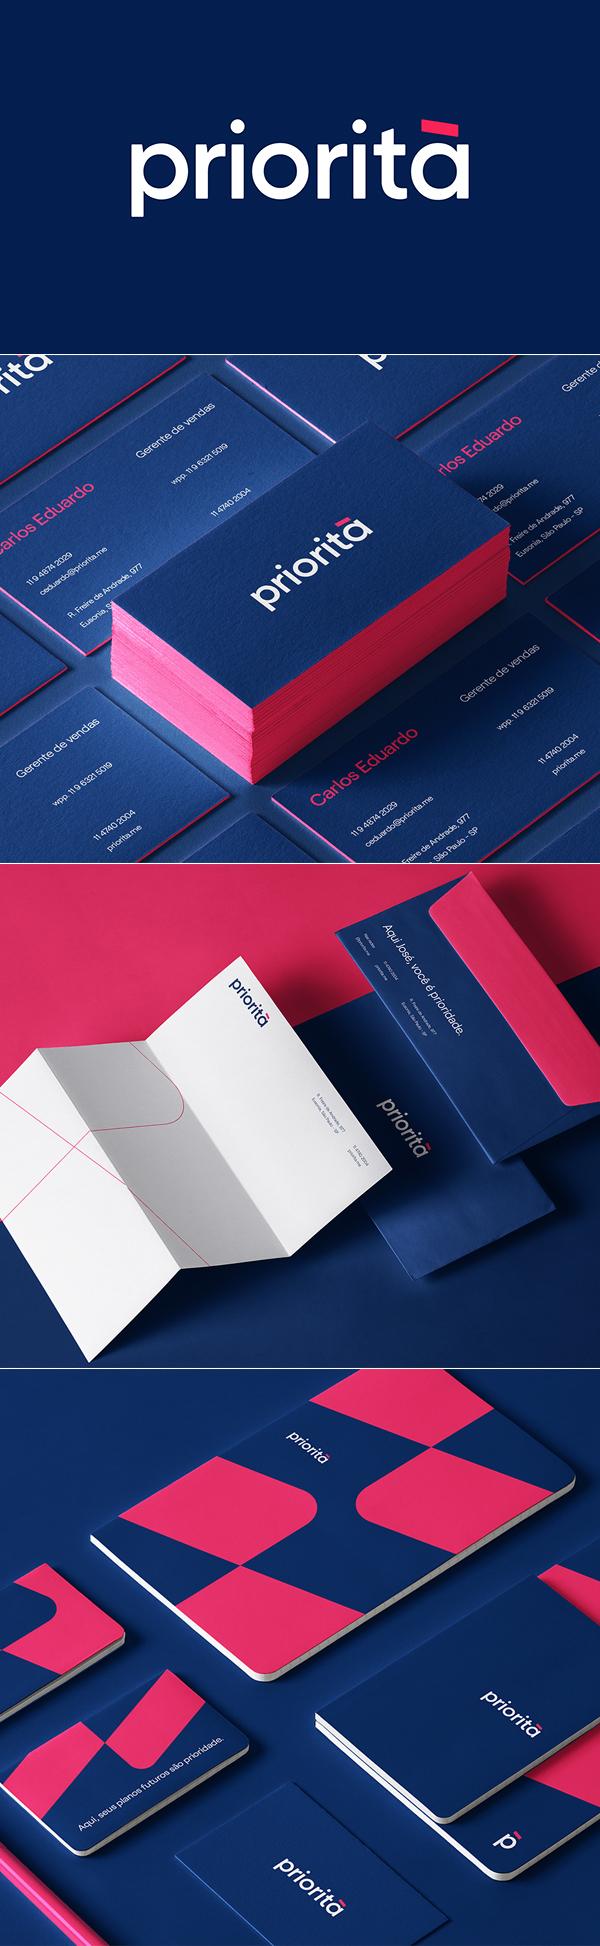 Stationery - Priorita Joao Branding Identity by Marcos